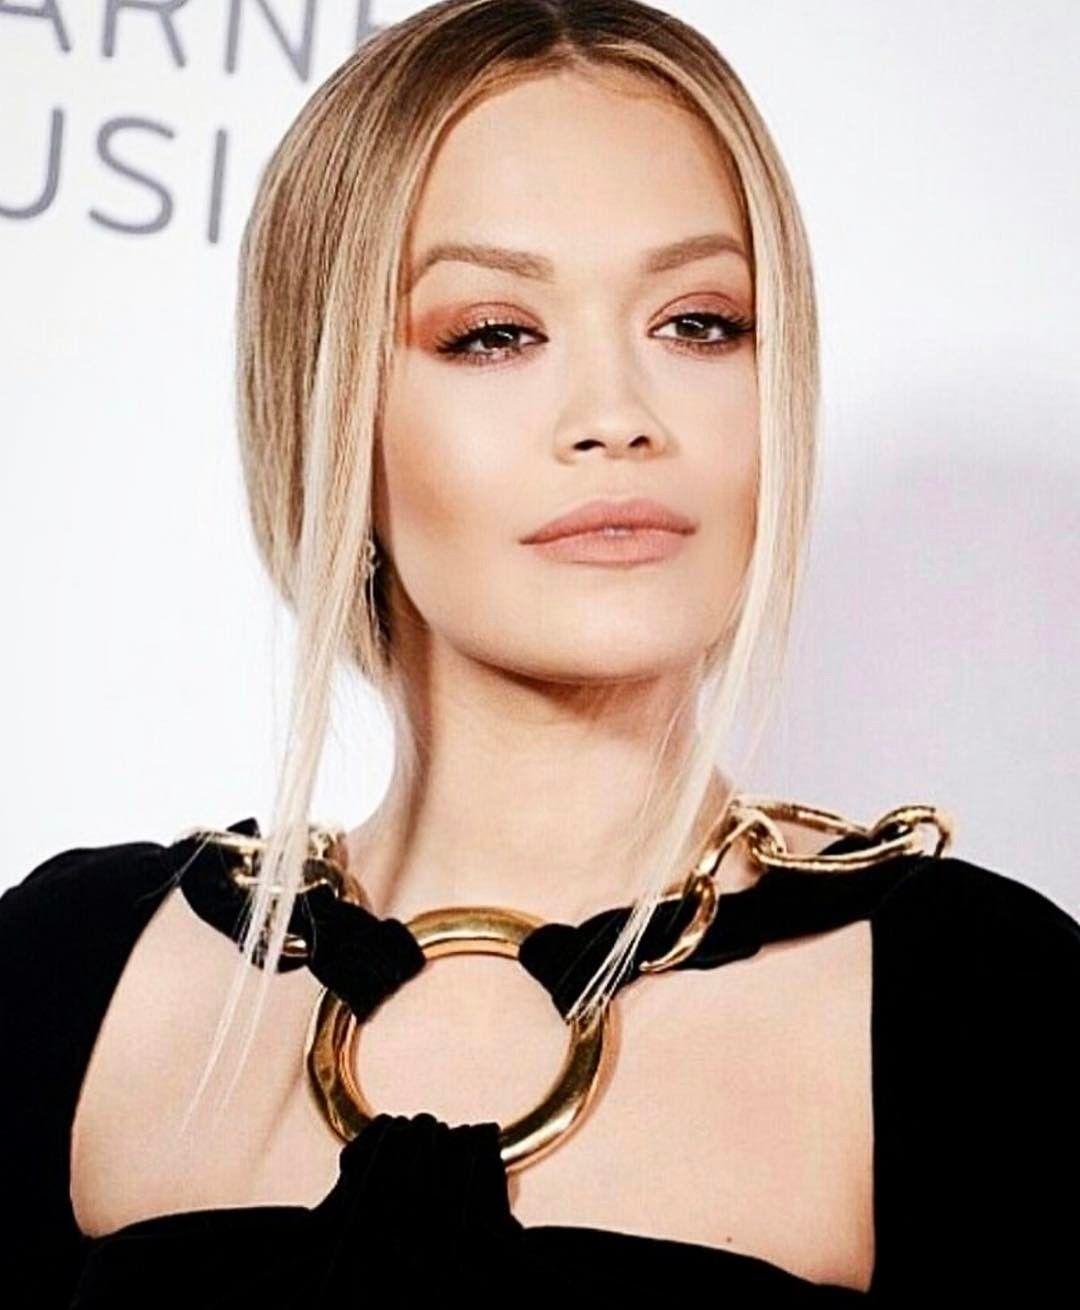 Rita Ora S Close Up Celebs Without Makeup Celebrity Style Inspiration Rita Ora